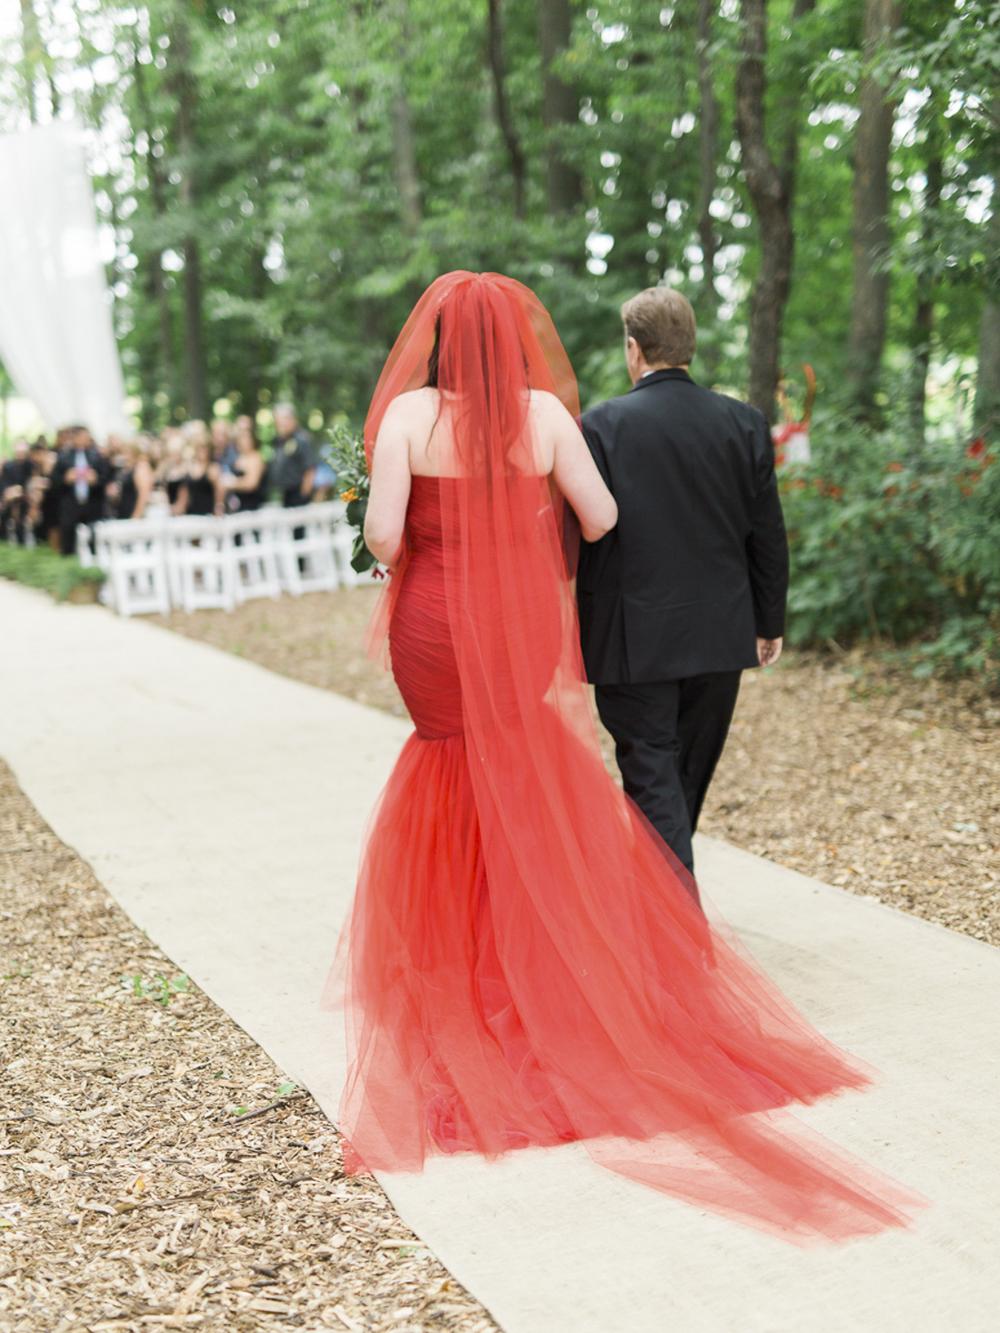 Waterdown-Backyard-Wedding-Blair-Matt-photography-by-Kurtz-Orpia028.jpg